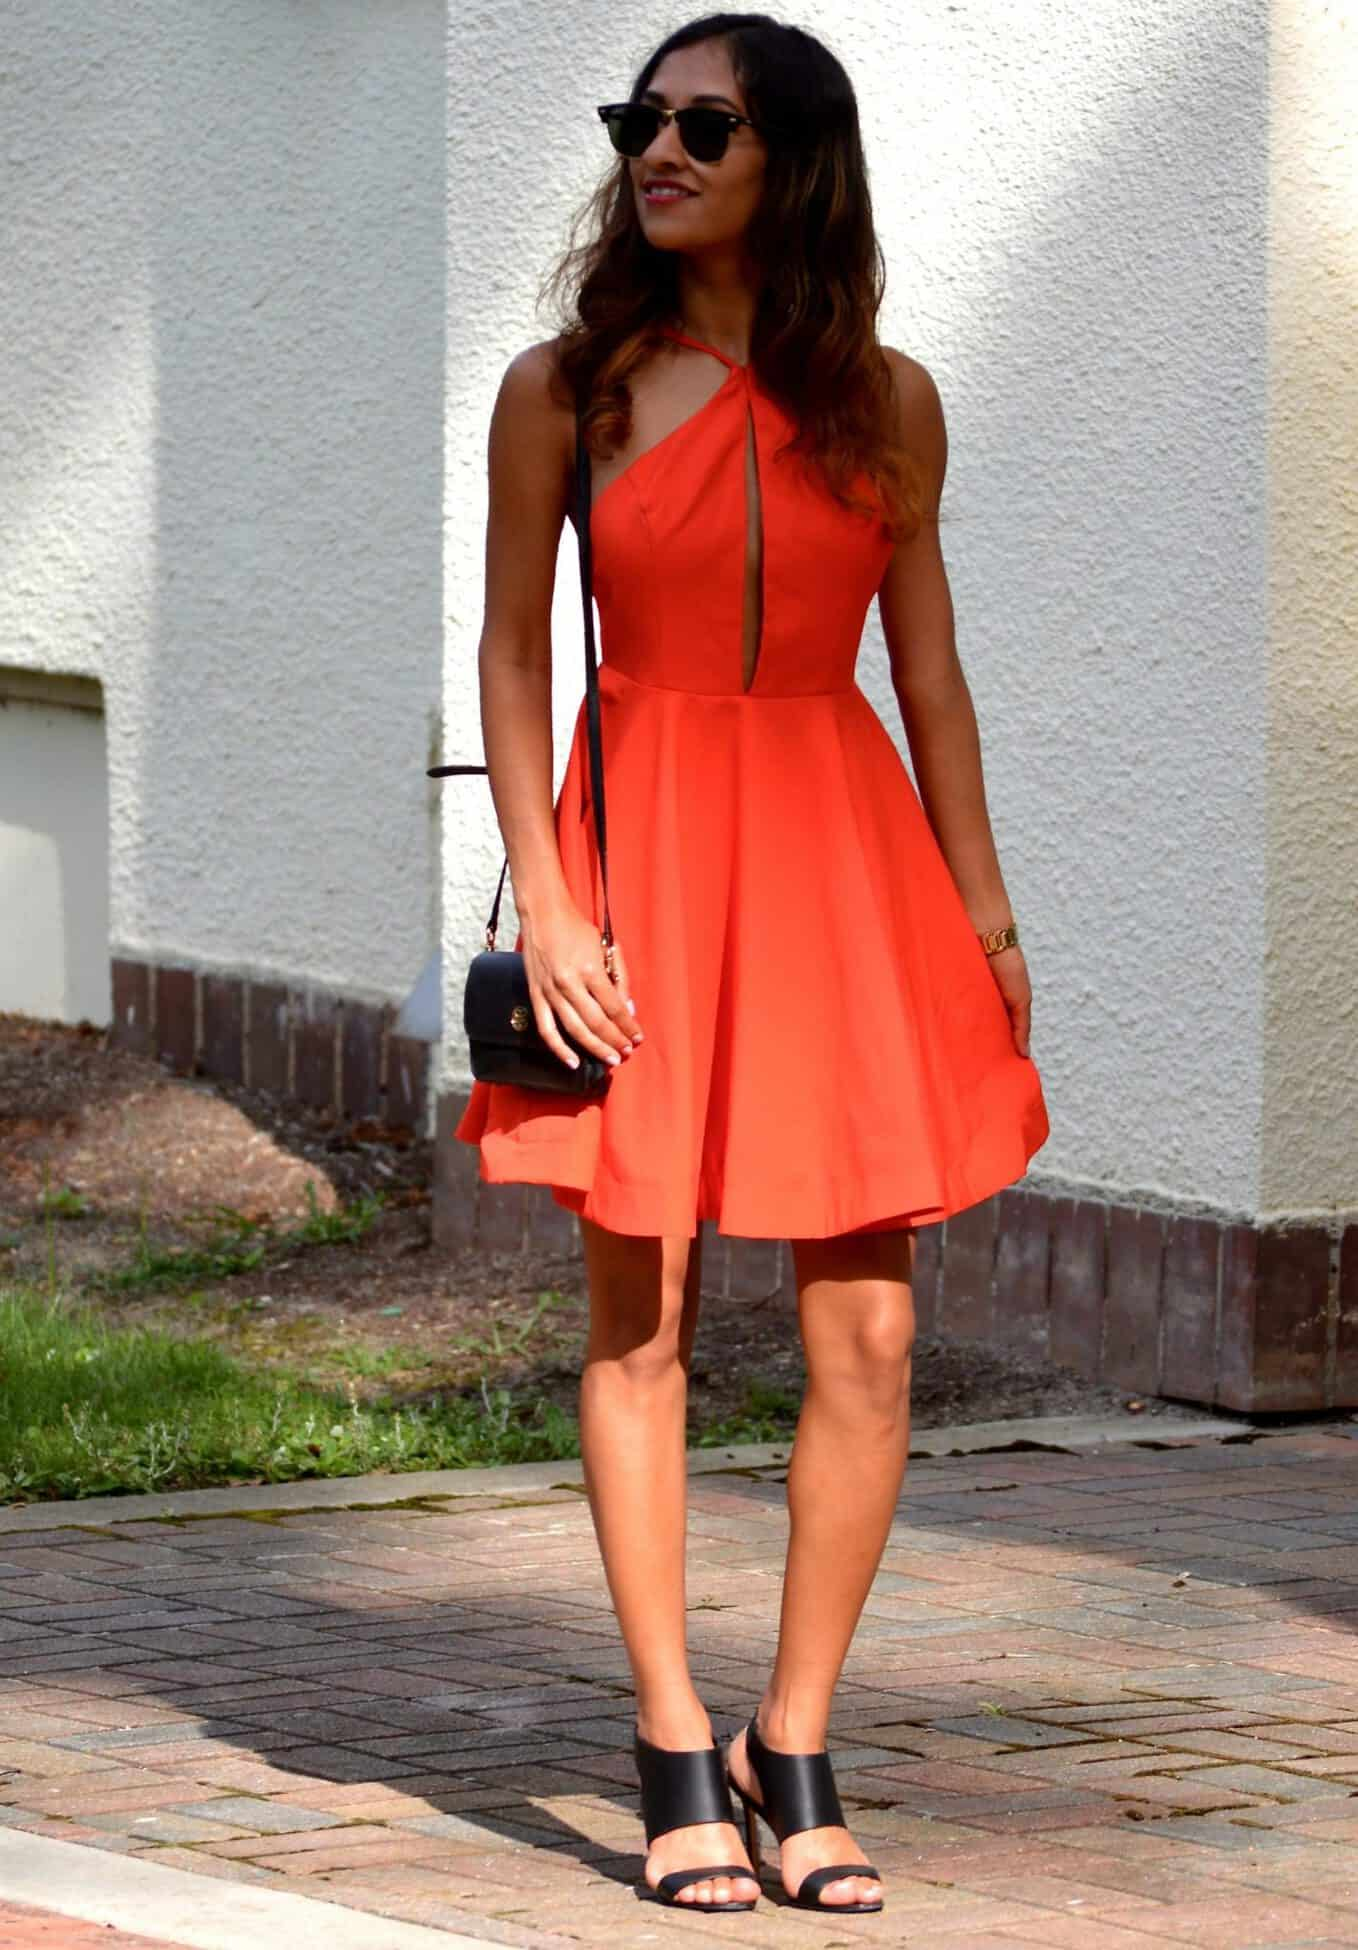 Black dress with red bag - Dress Nasty Gal Shoes Manolo Blahnik Similar Bag Tory Burch Watch Kate Spade Sunnies Ray Ban